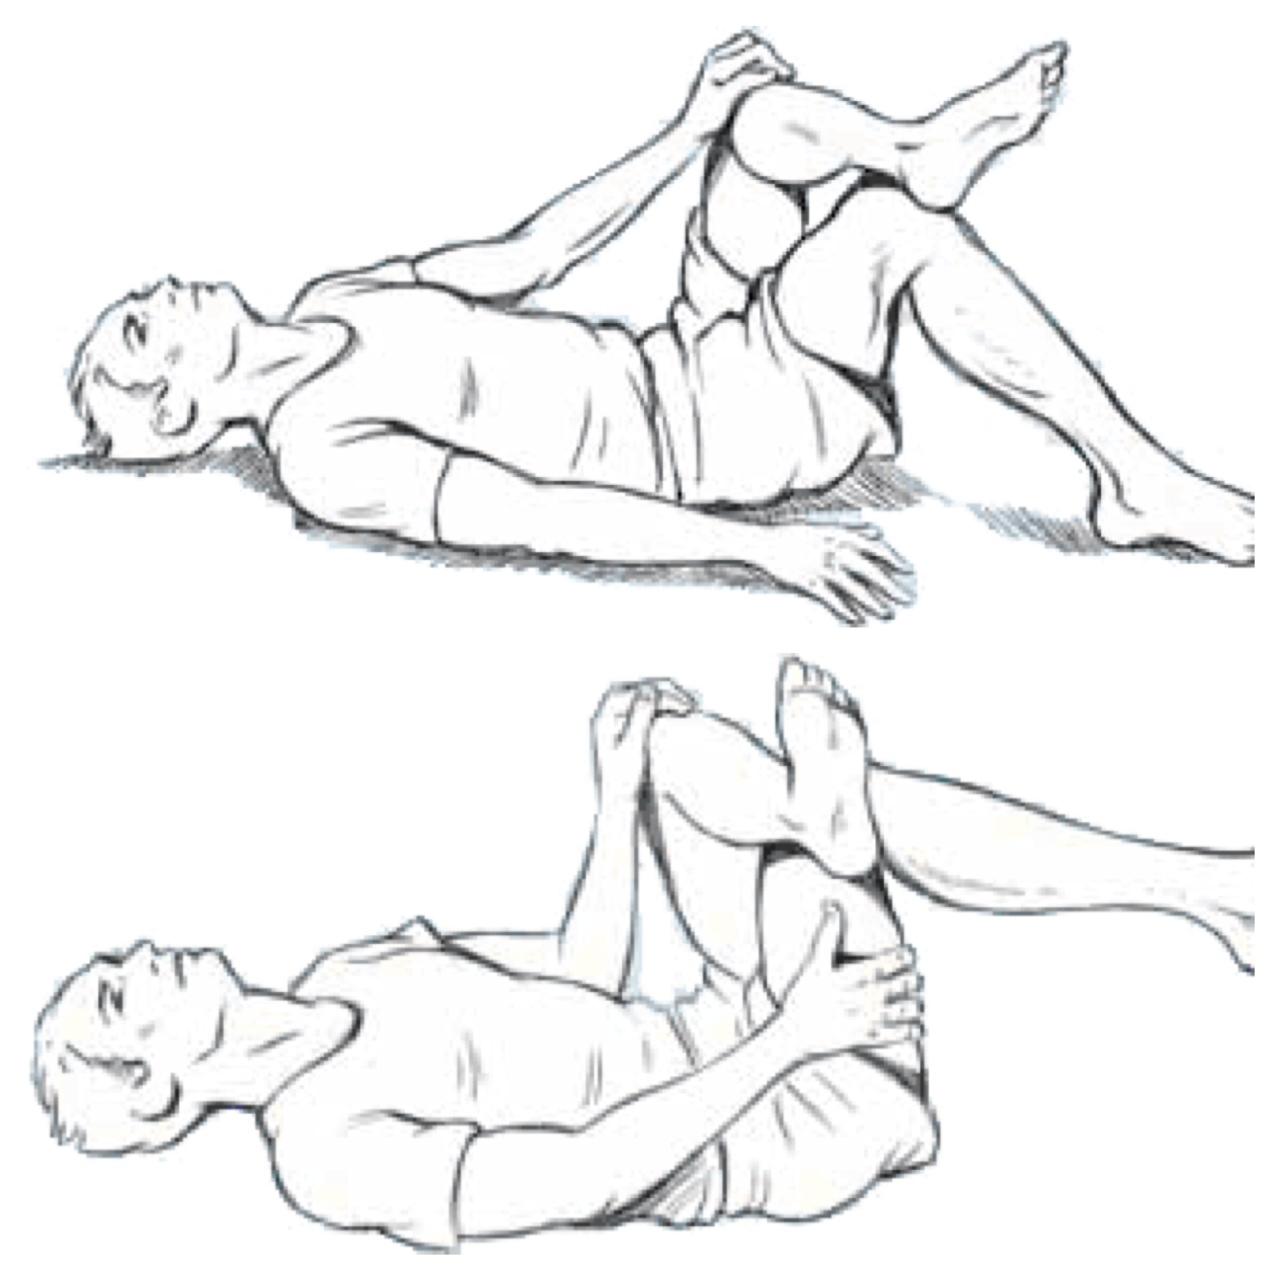 Piriformis Muscle Lower Back Anatomy Diagram